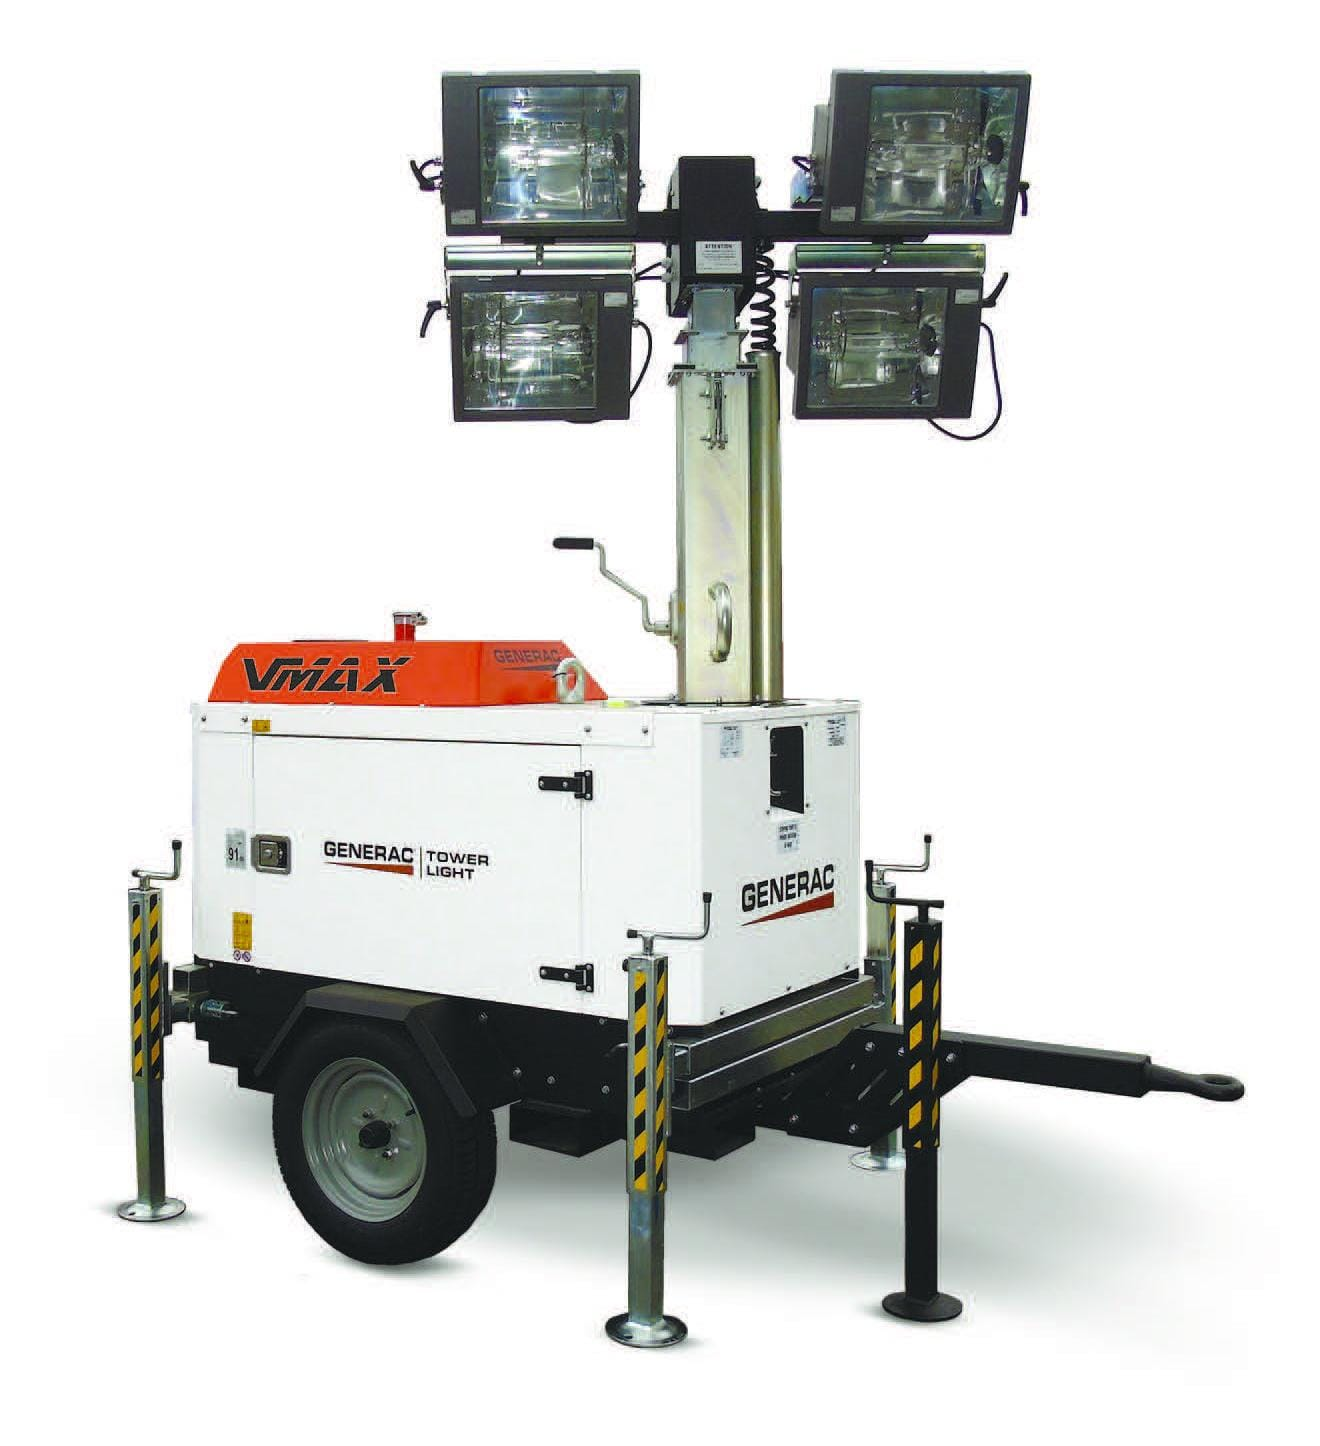 Turn de lumina GENERAC V-MAX Y 4x1000W